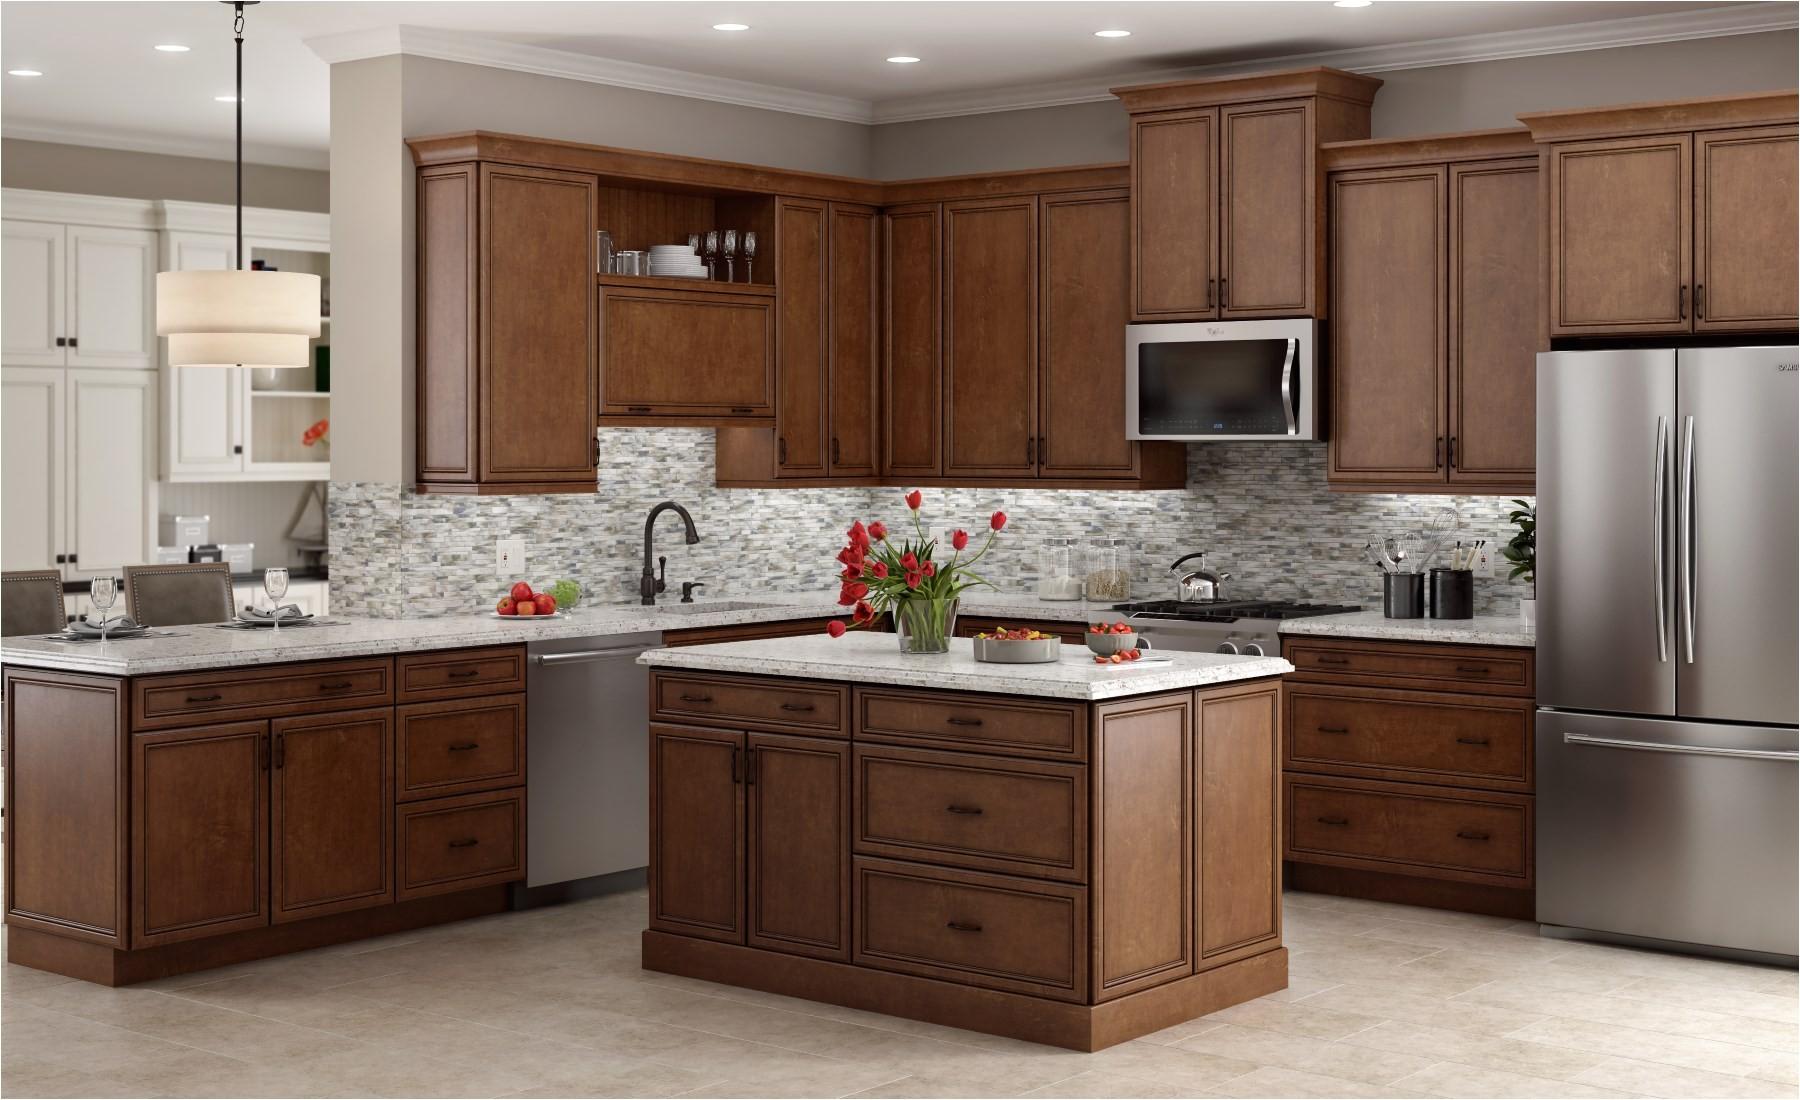 Who Makes Hampton Bay Kitchen Cabinets 28 Hampton Bay Kitchen Cabinets Related who Makes Kitchen